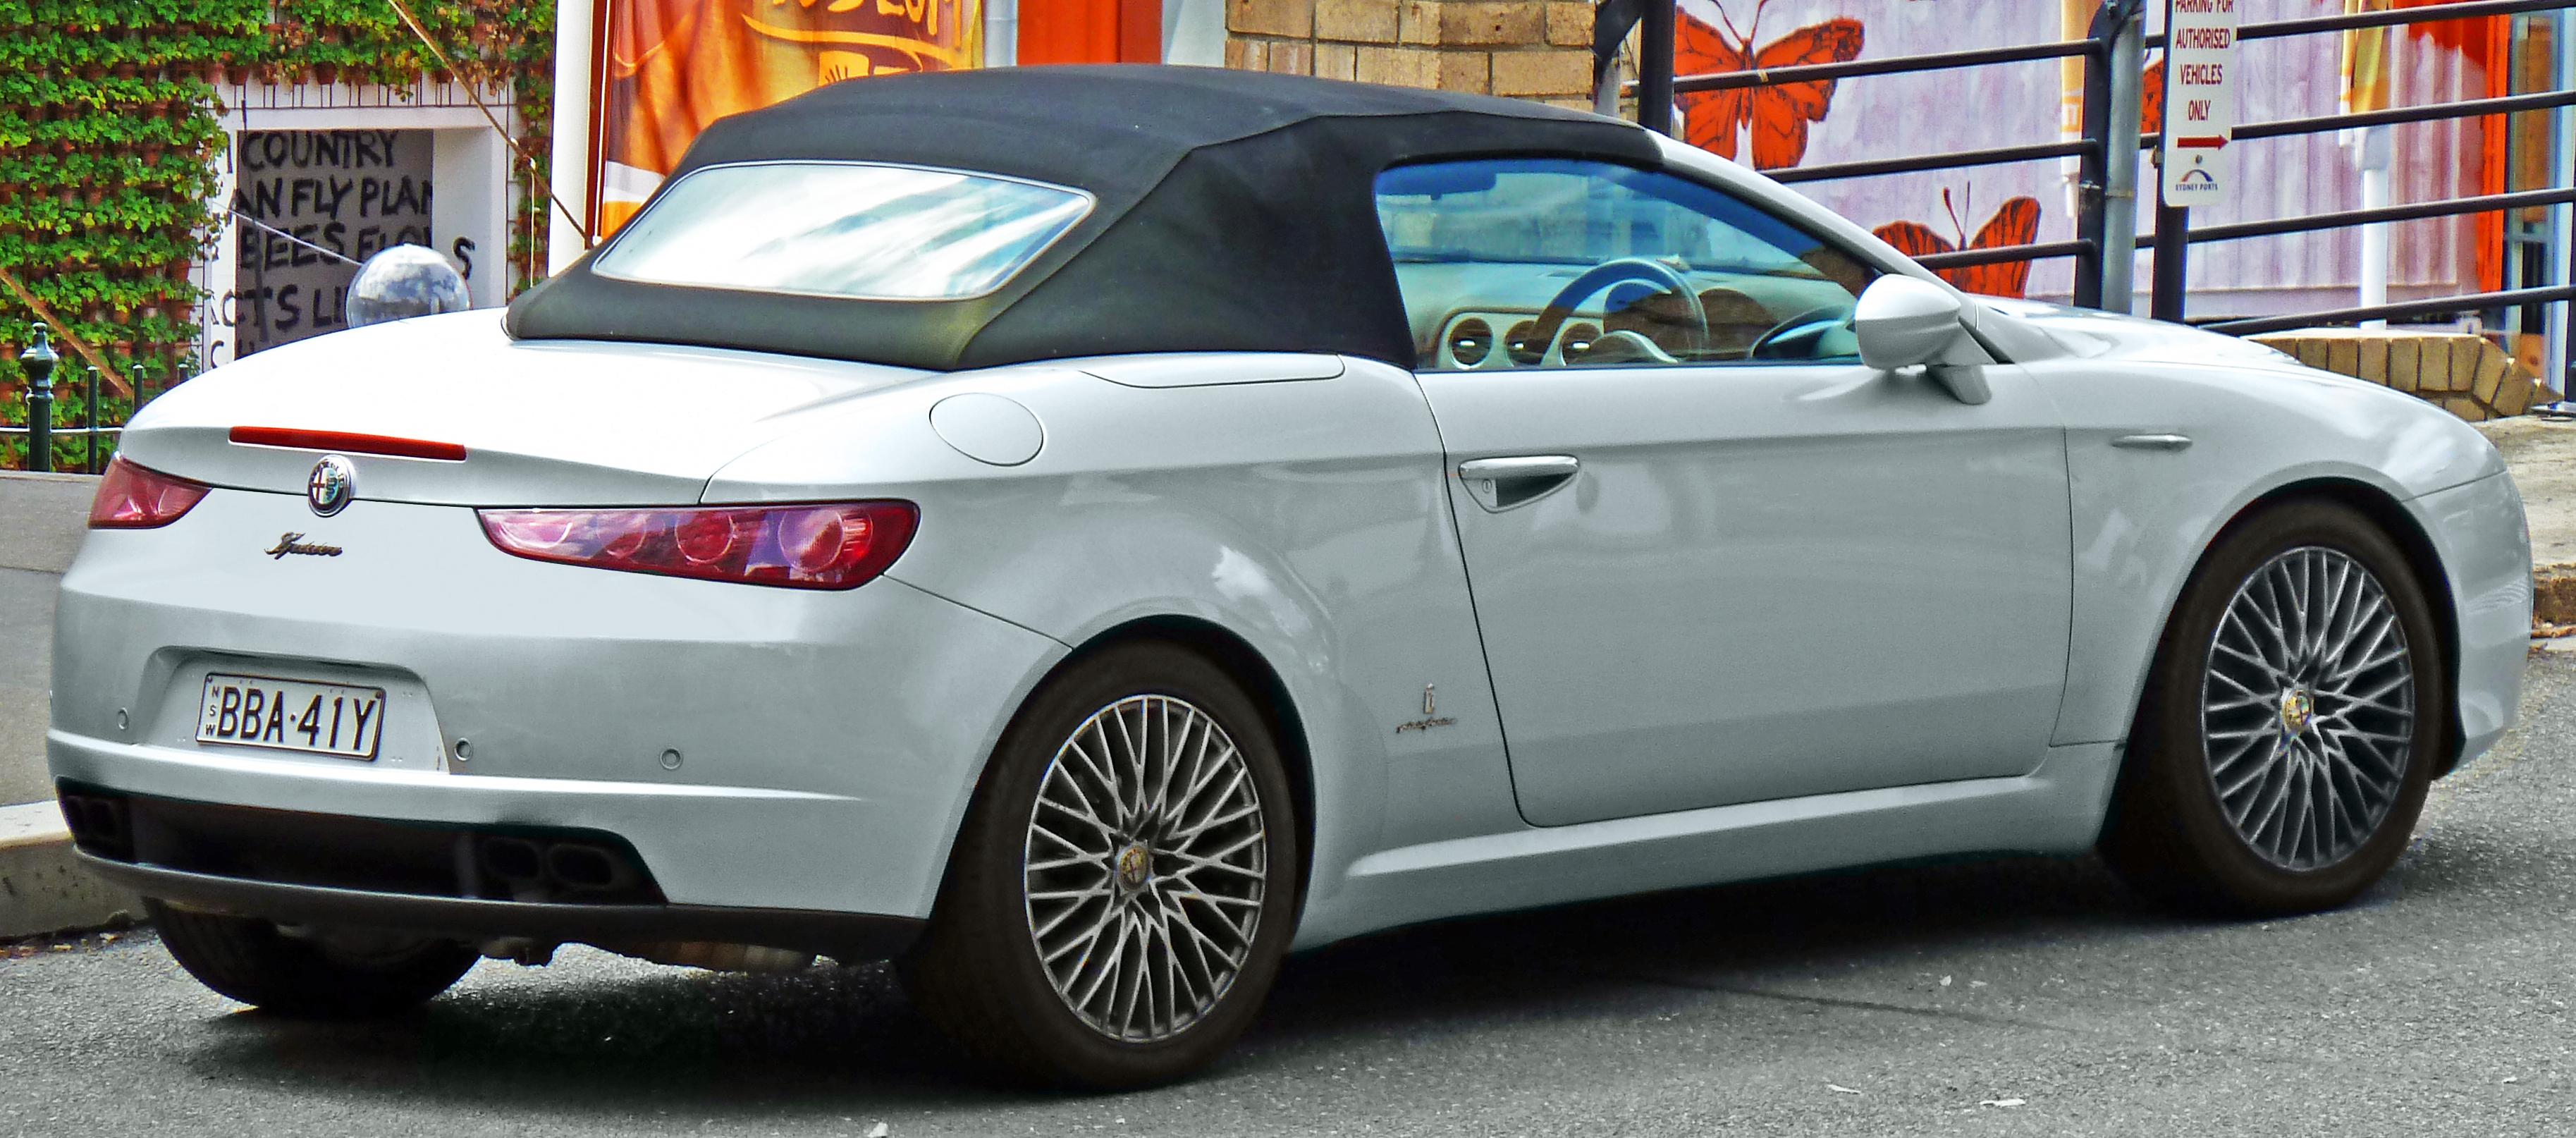 File:2006-2011 Alfa Romeo Spider JTS V6 convertible (2011 ...